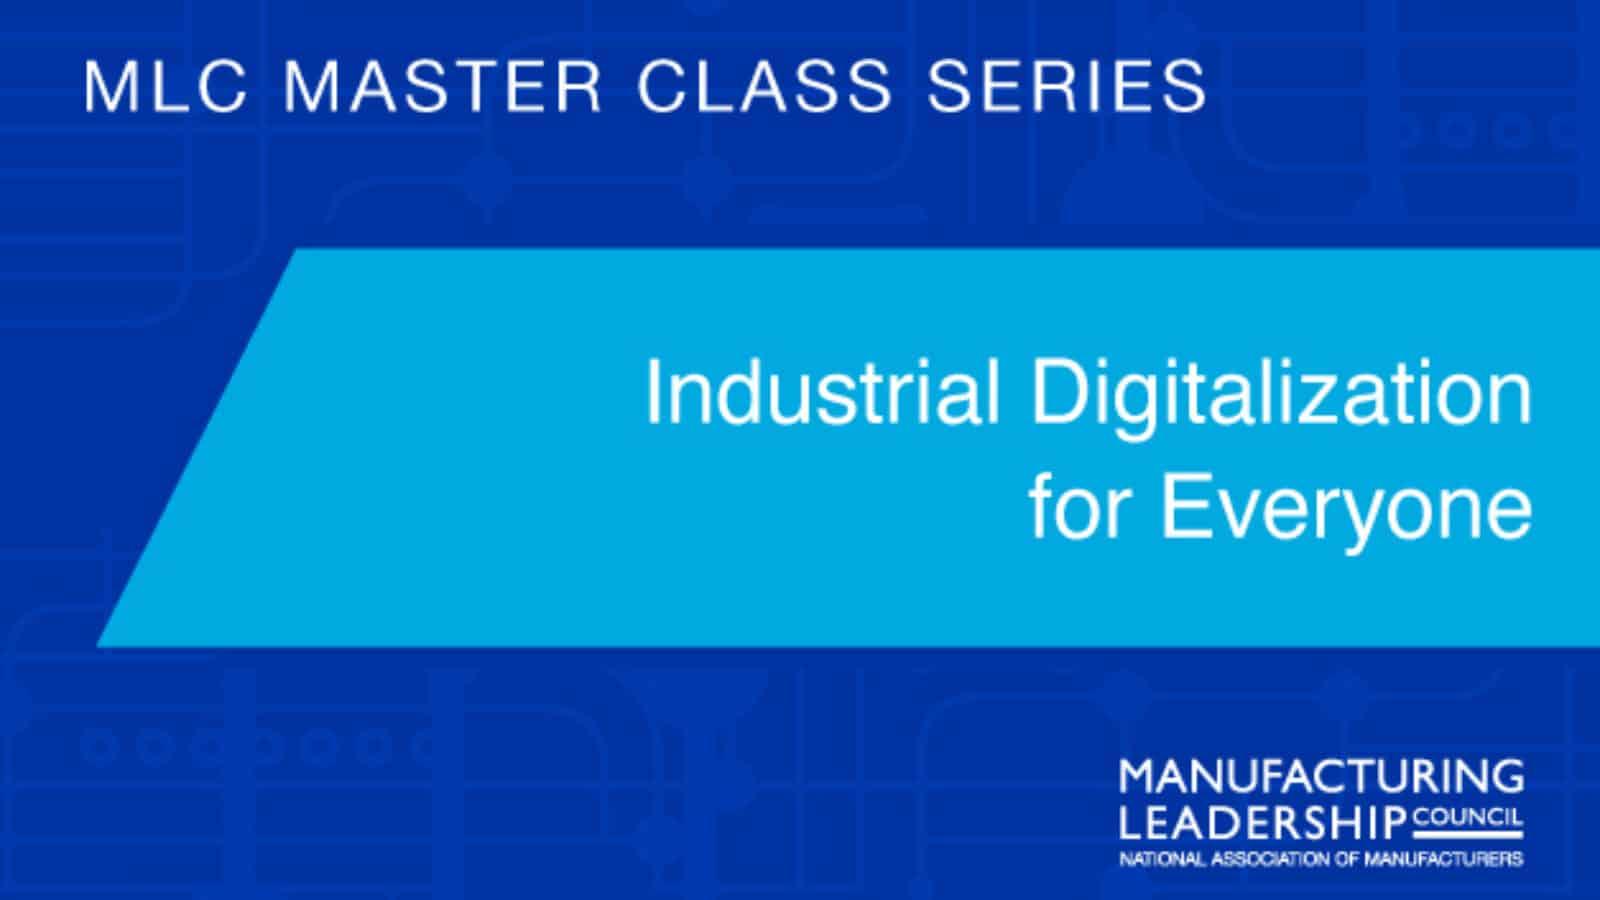 Industrial Digitalization for Everyone